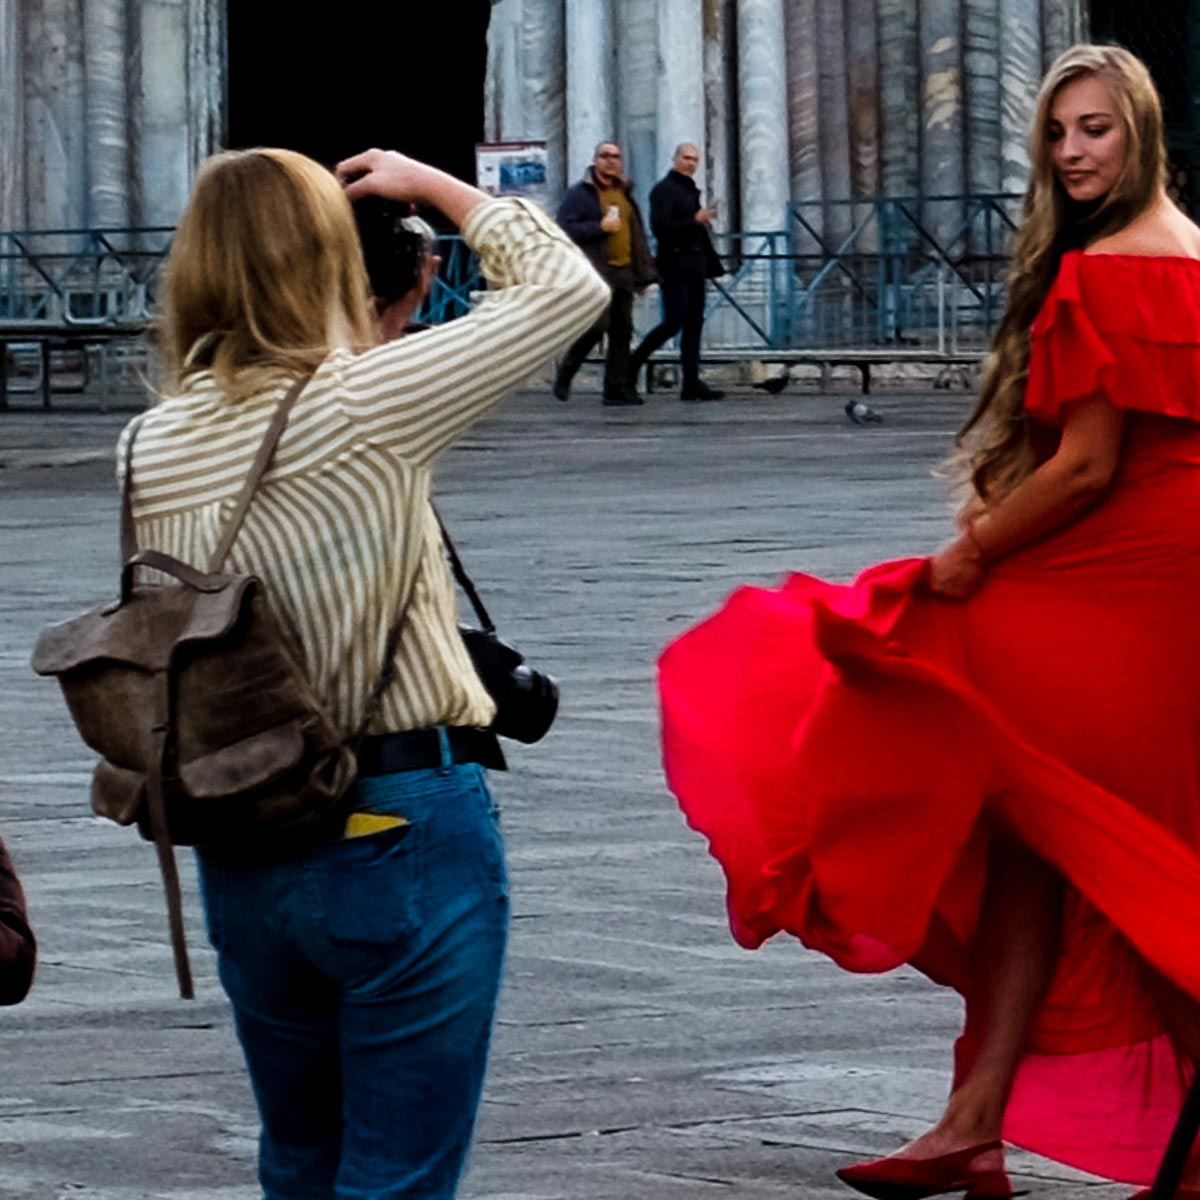 San Marco, Venezia. Detail of a digital photo. Fuji X-E2, 27mm f2.8